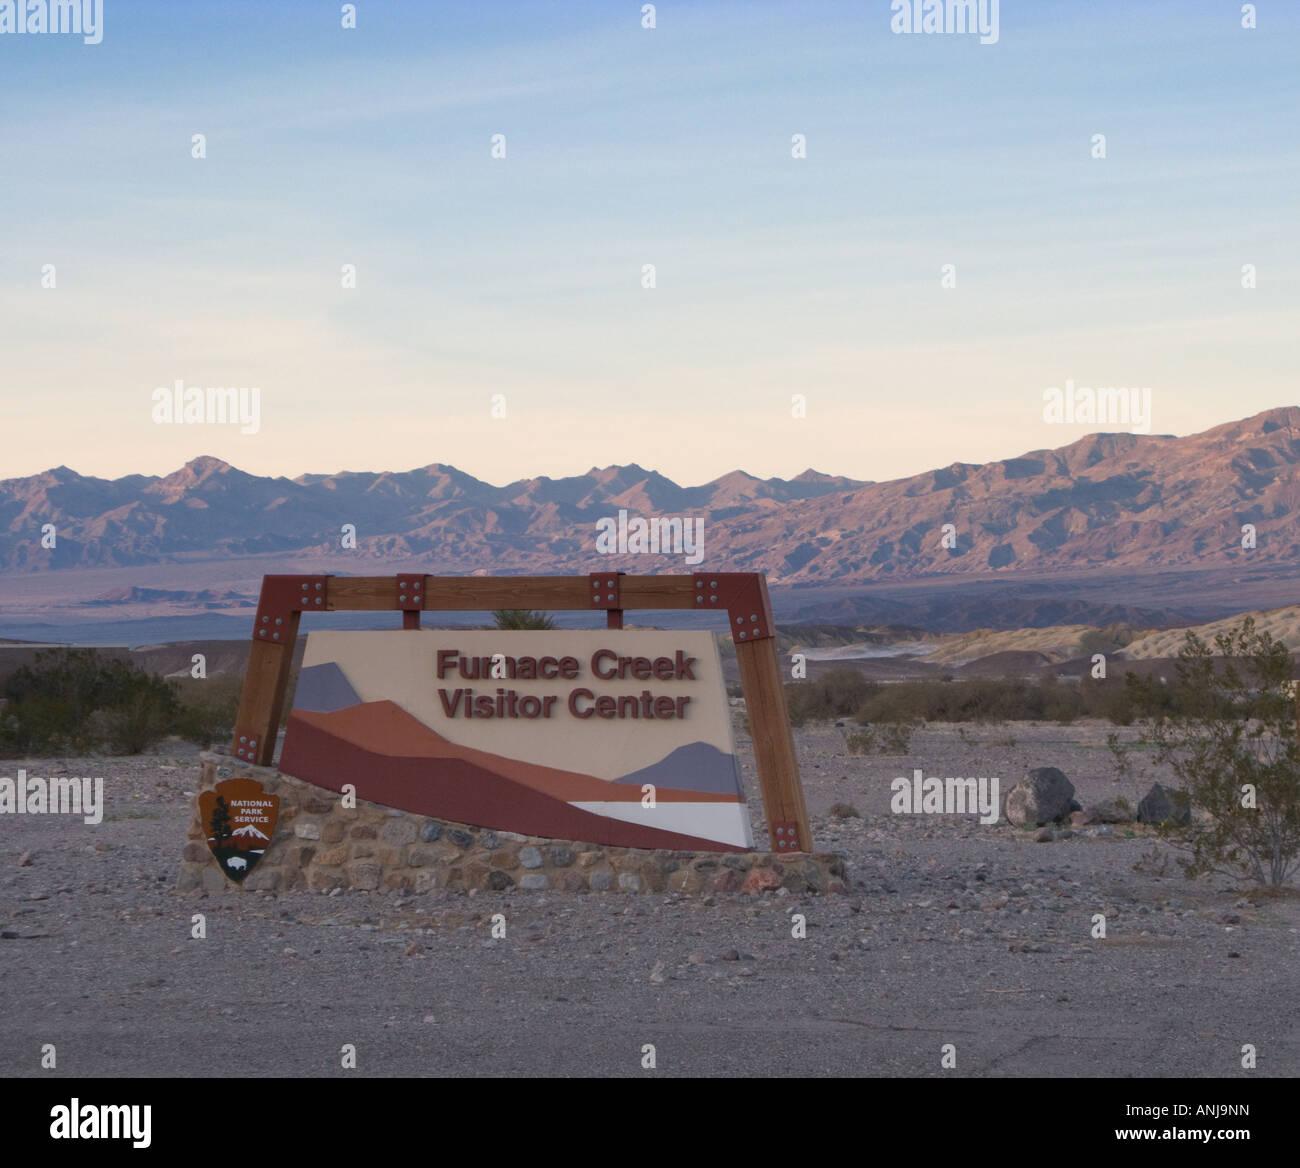 Furnace Creek Visitor Center Sign, Death Valley National